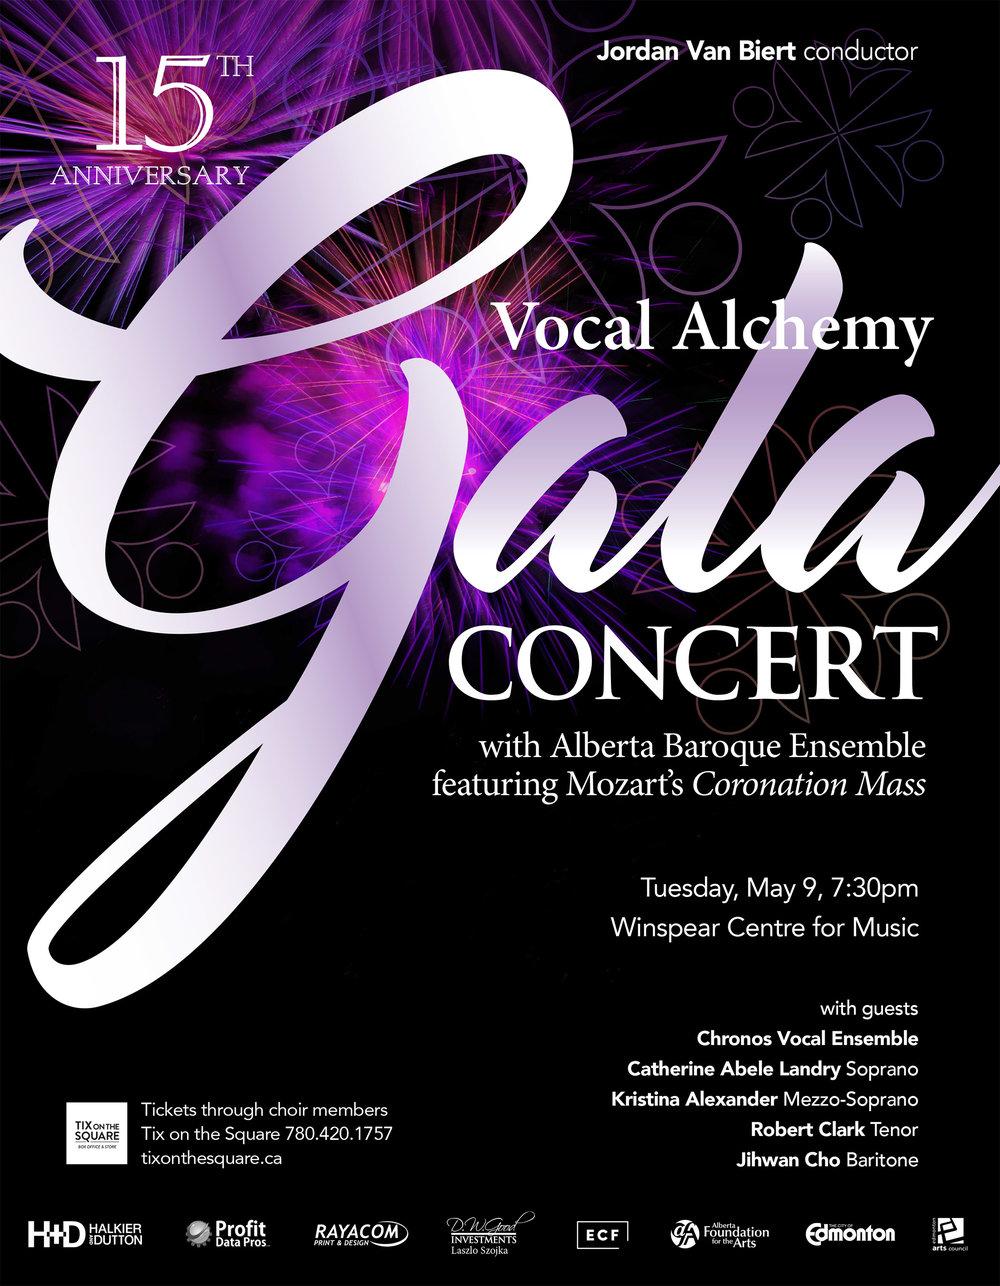 Vocal_Alchemy_gala.jpg